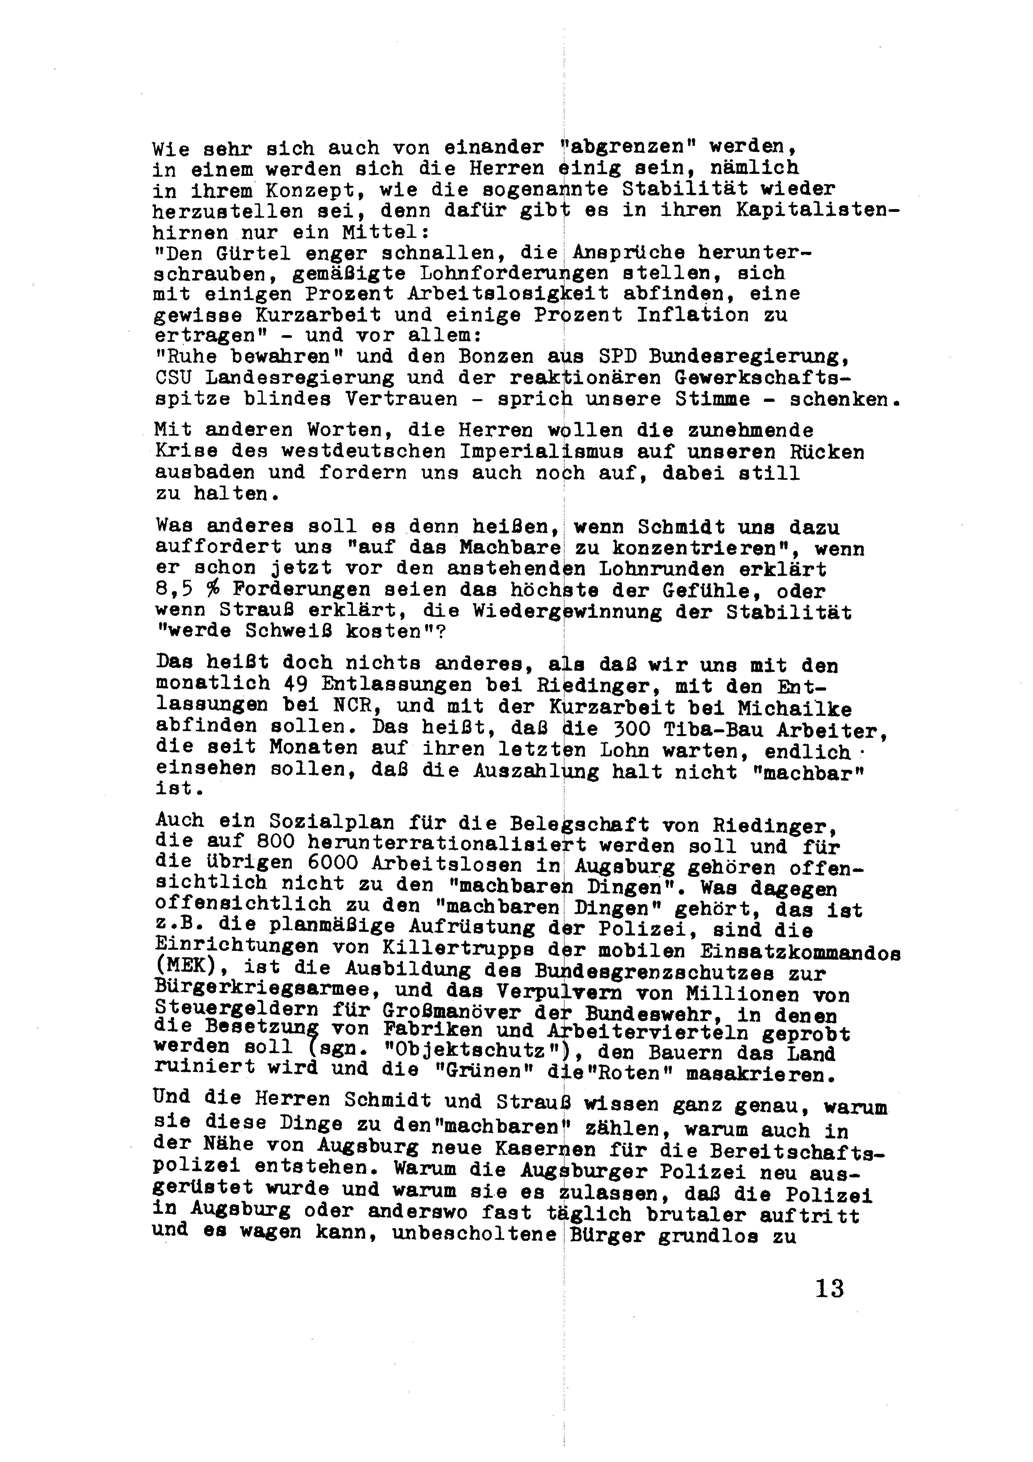 RHeV_Anschuldigung_RA_Gildemeier_Seite_13